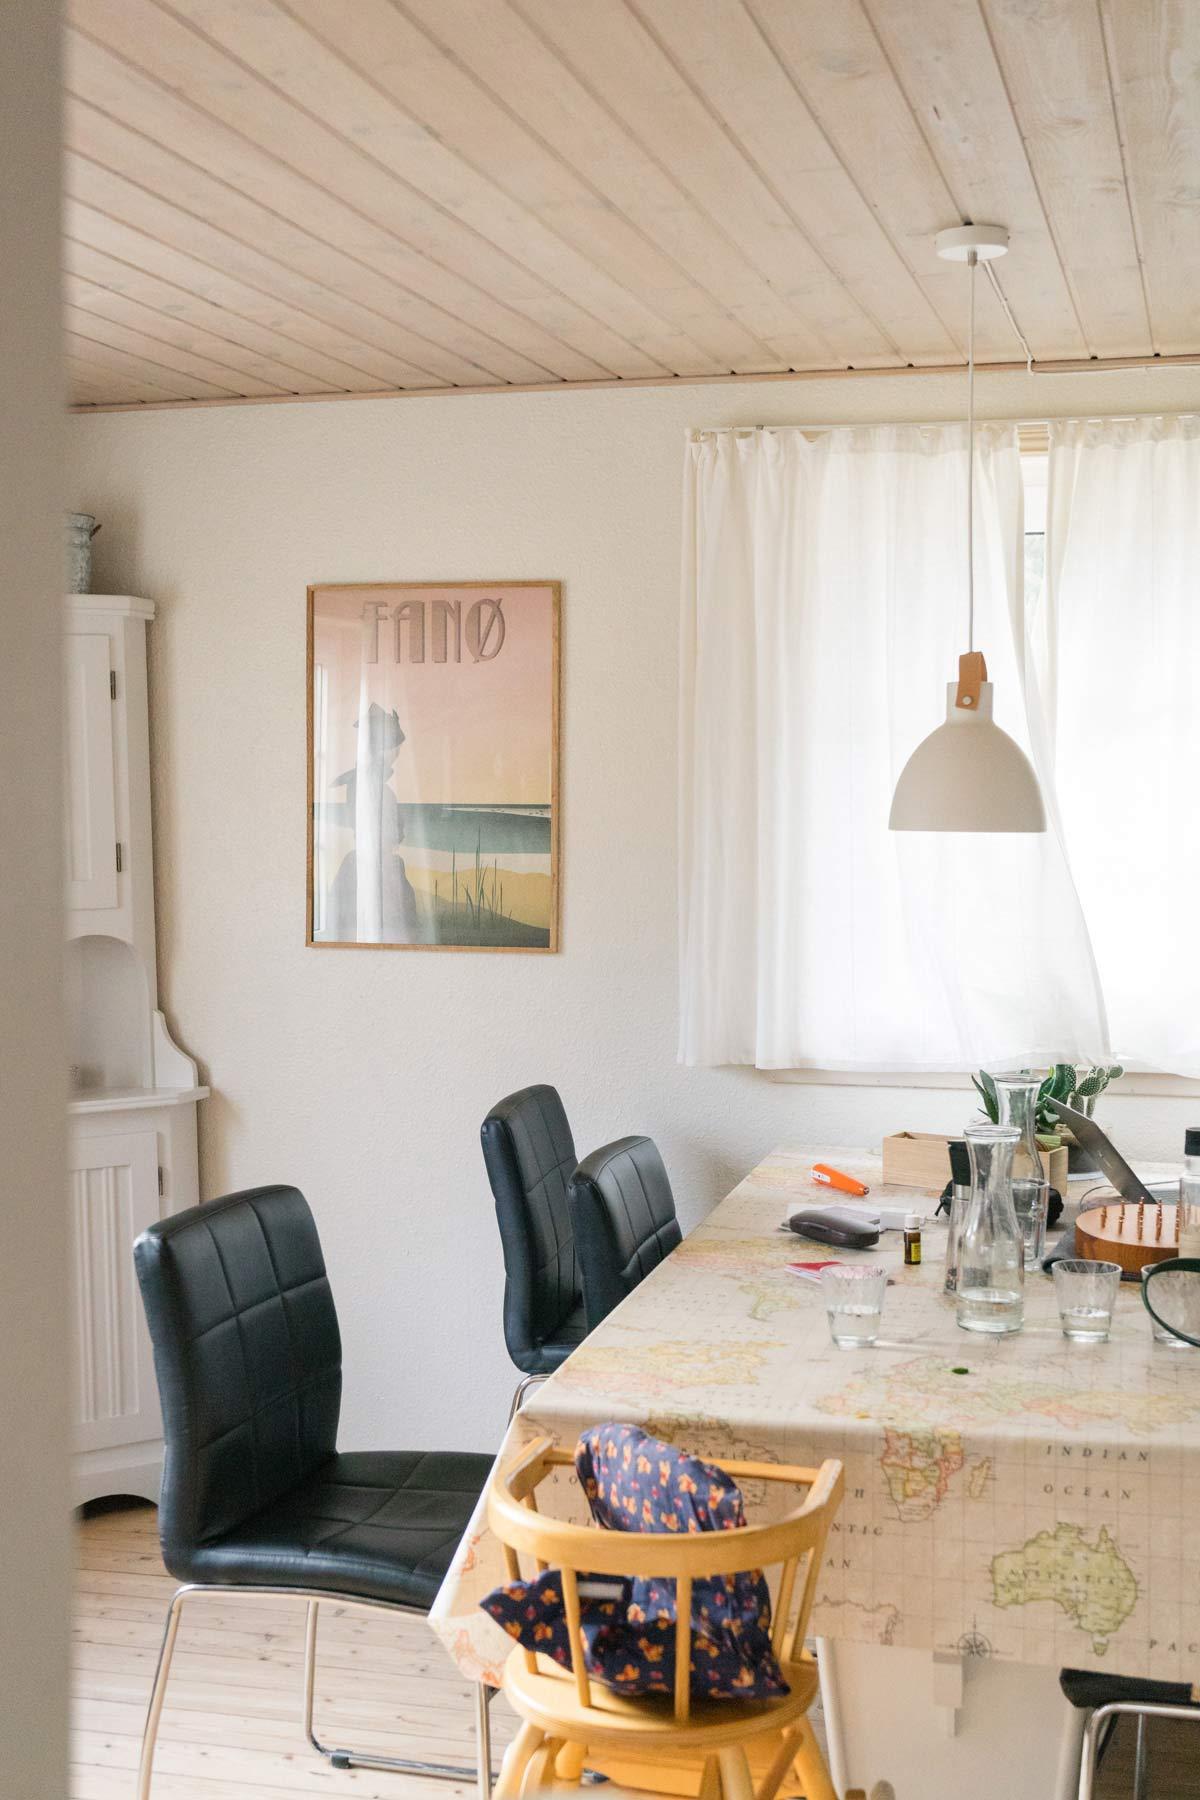 private Ferienwohnung auf Fanoe